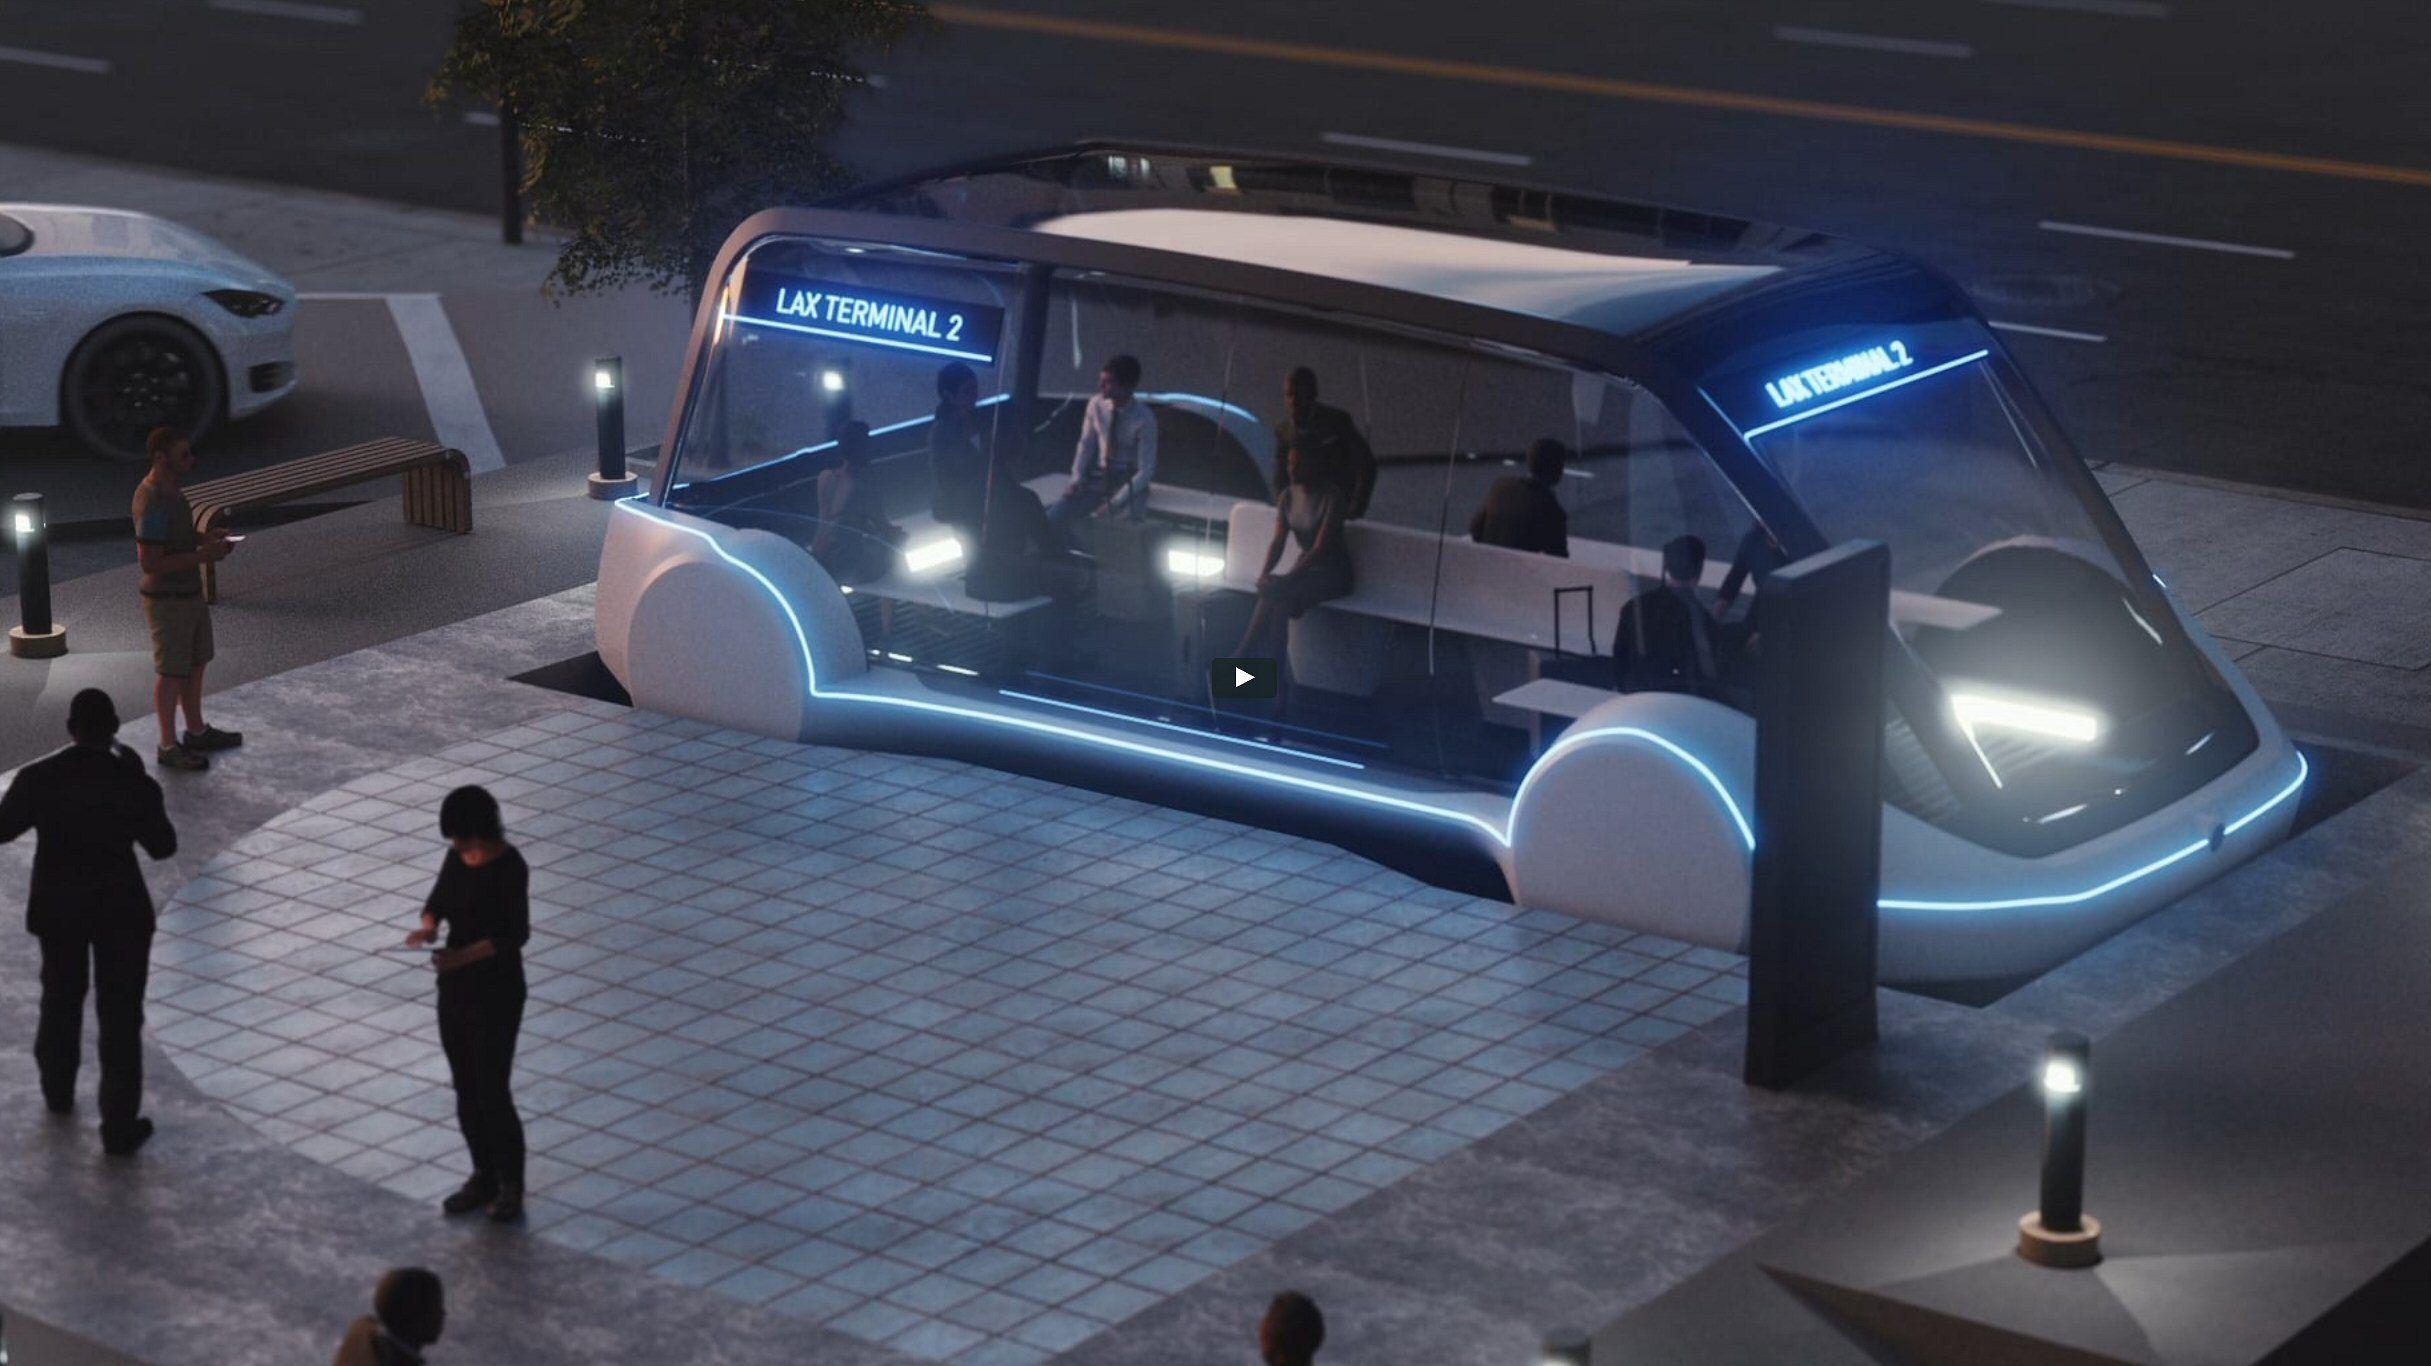 Grønt lys for Elon Musks futuristiske transport